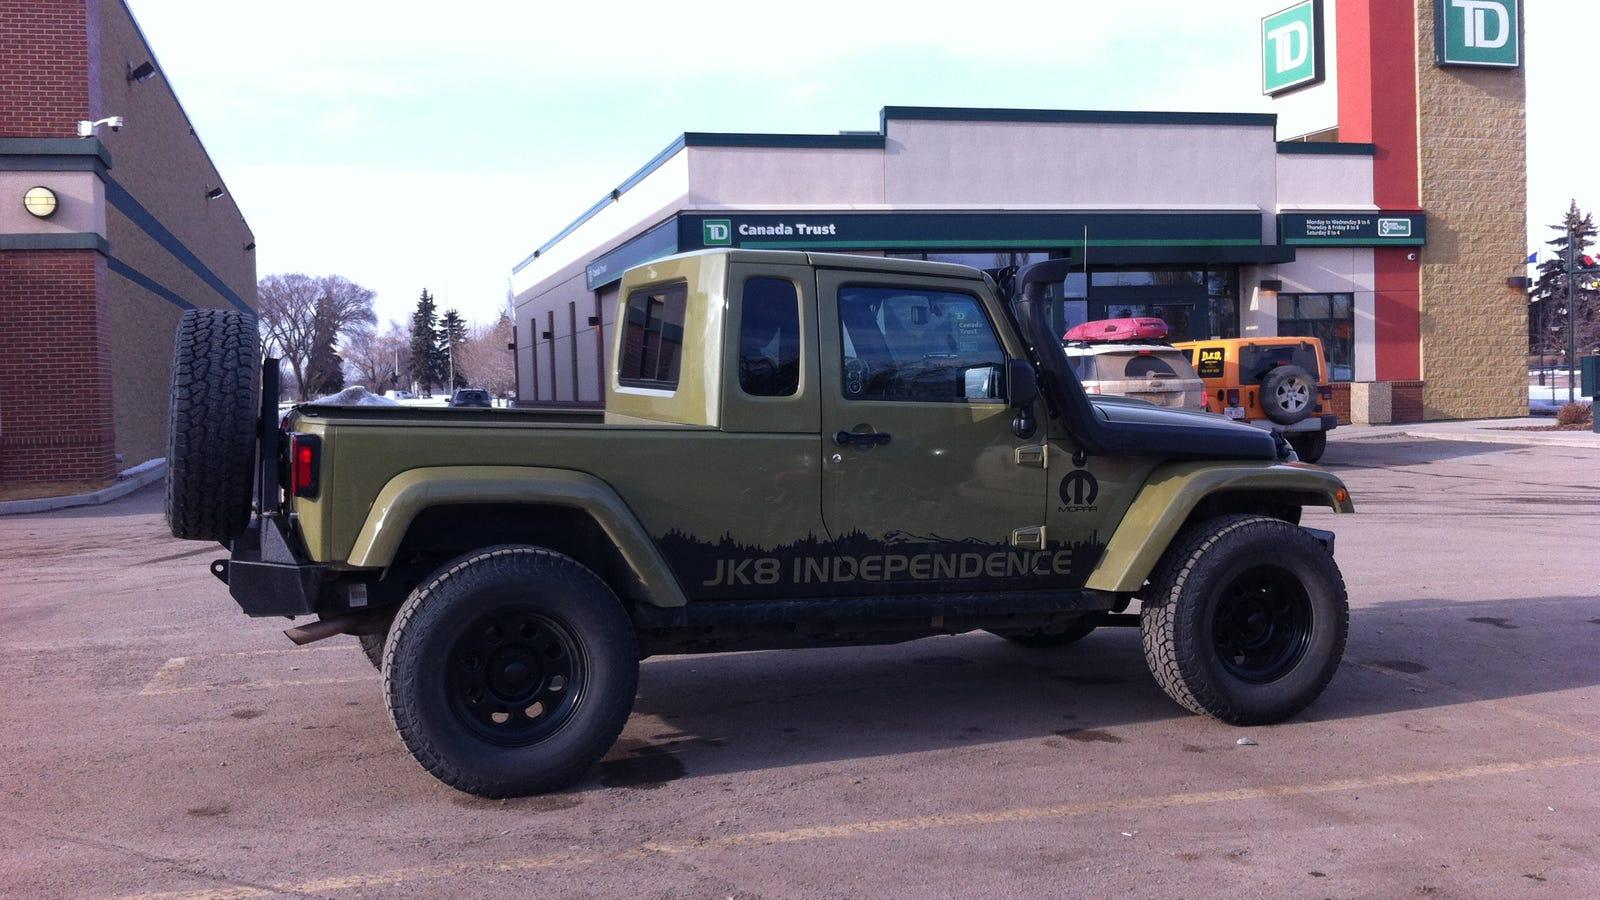 spotted in edmonton: jeep wrangler jk8 conversion.